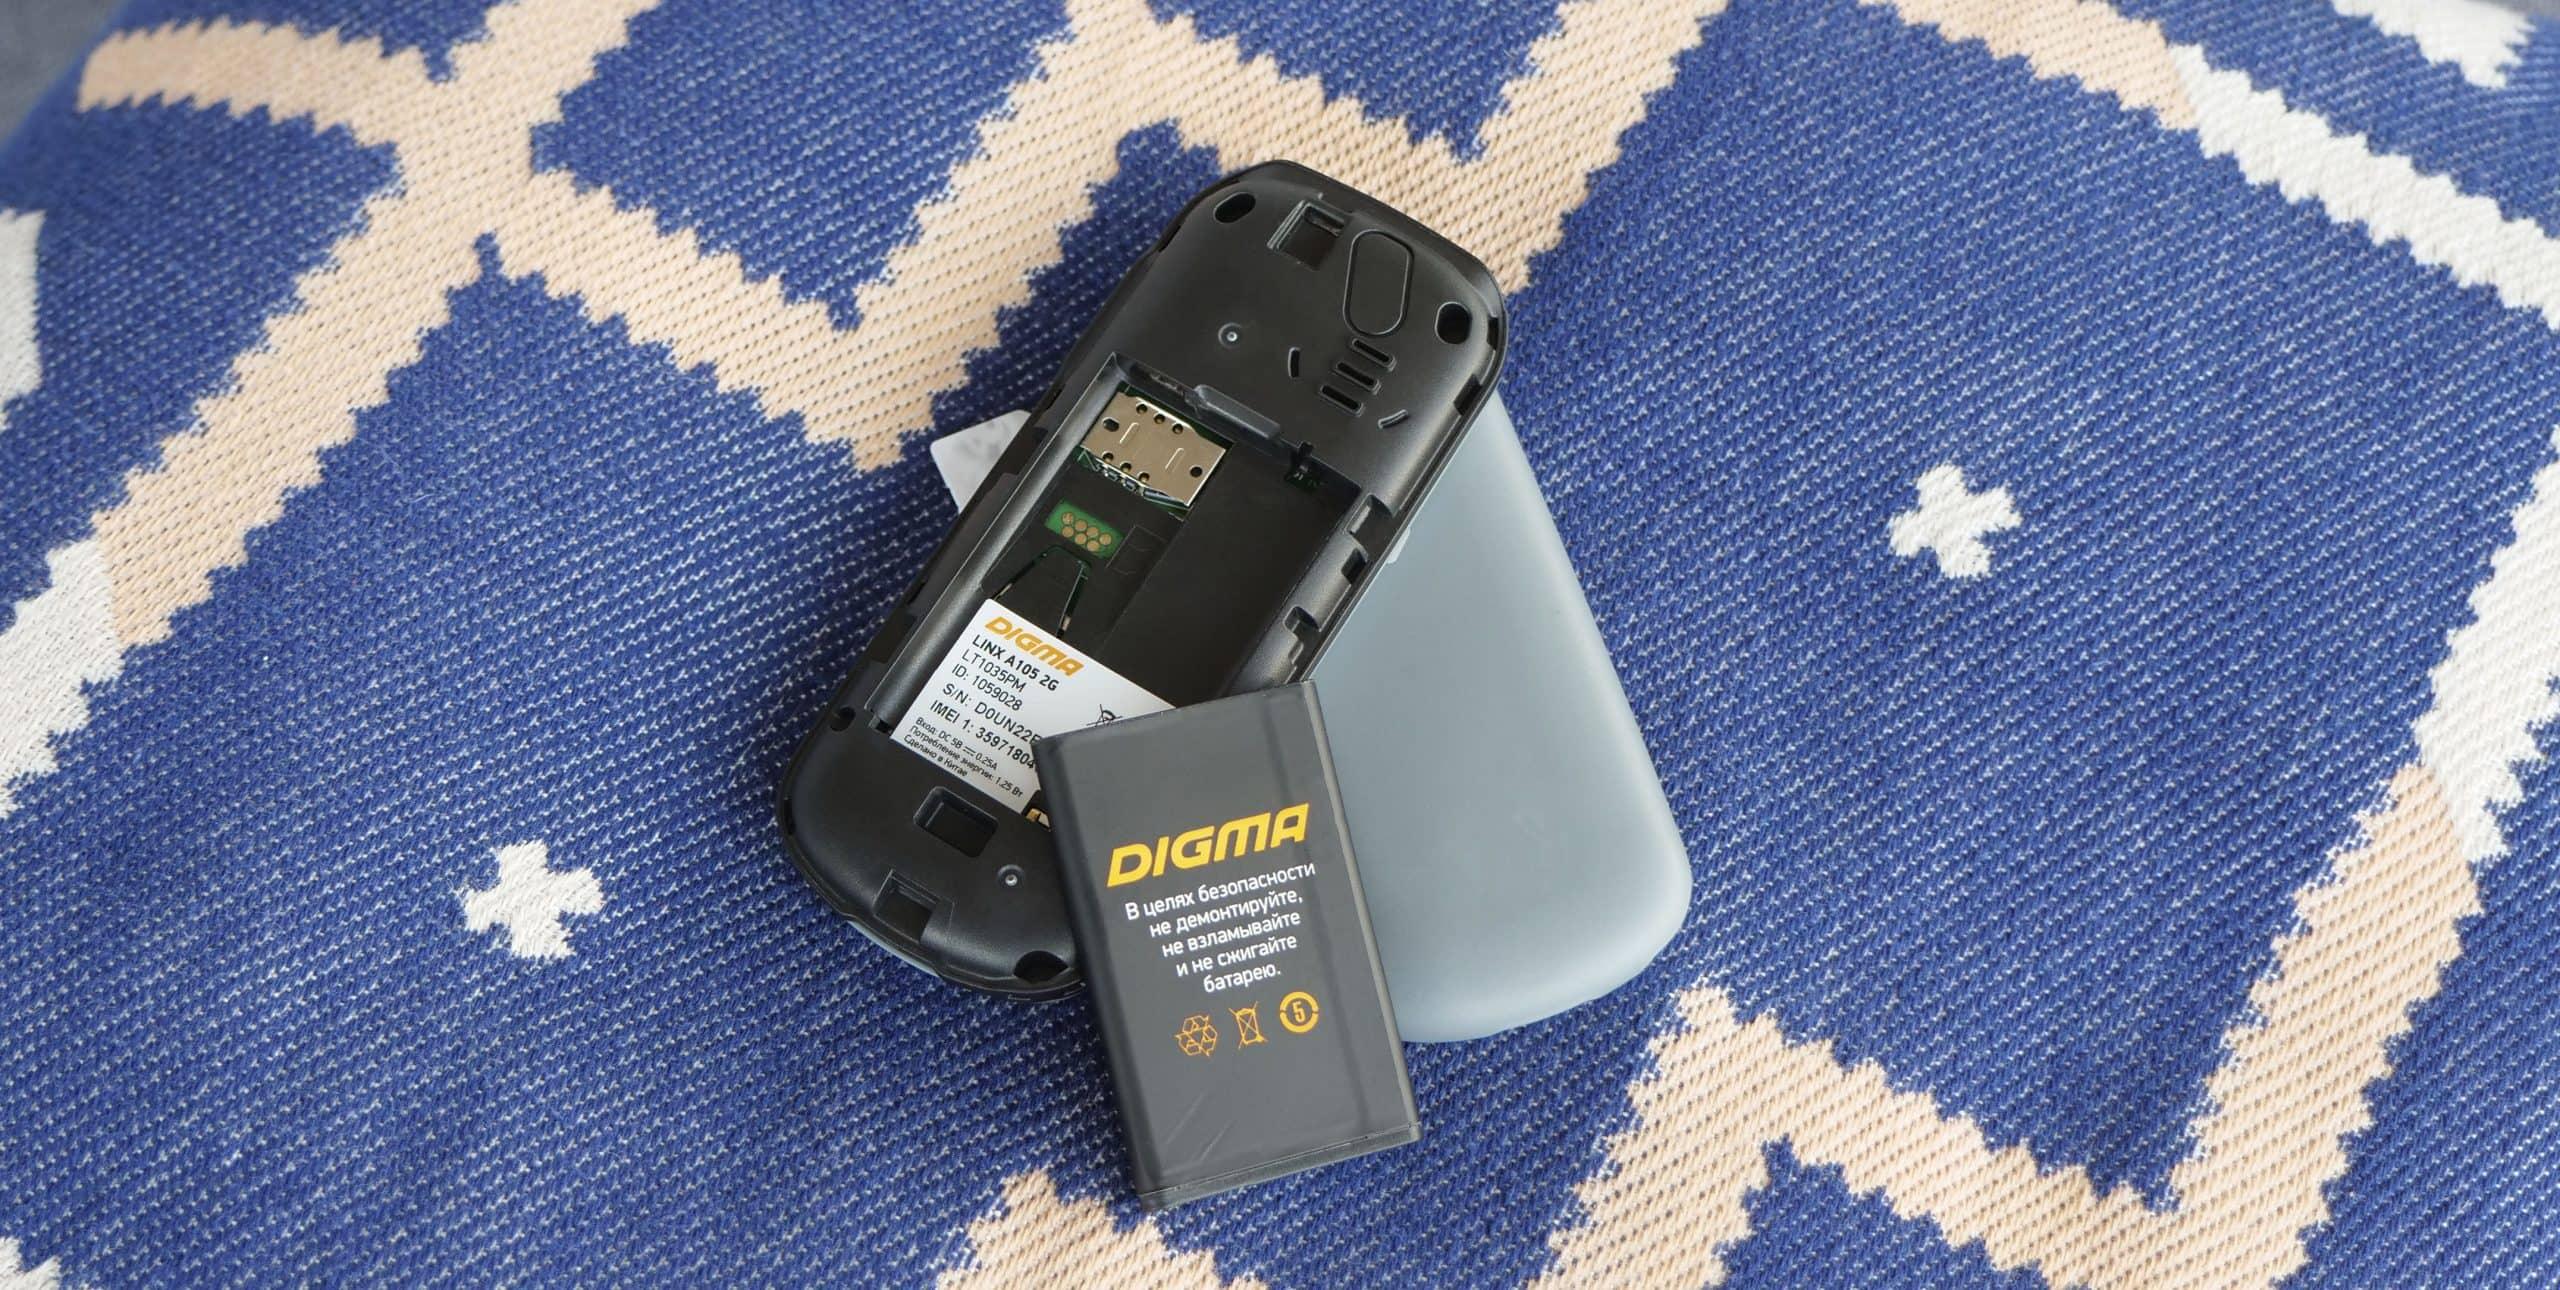 Digma LINX A105